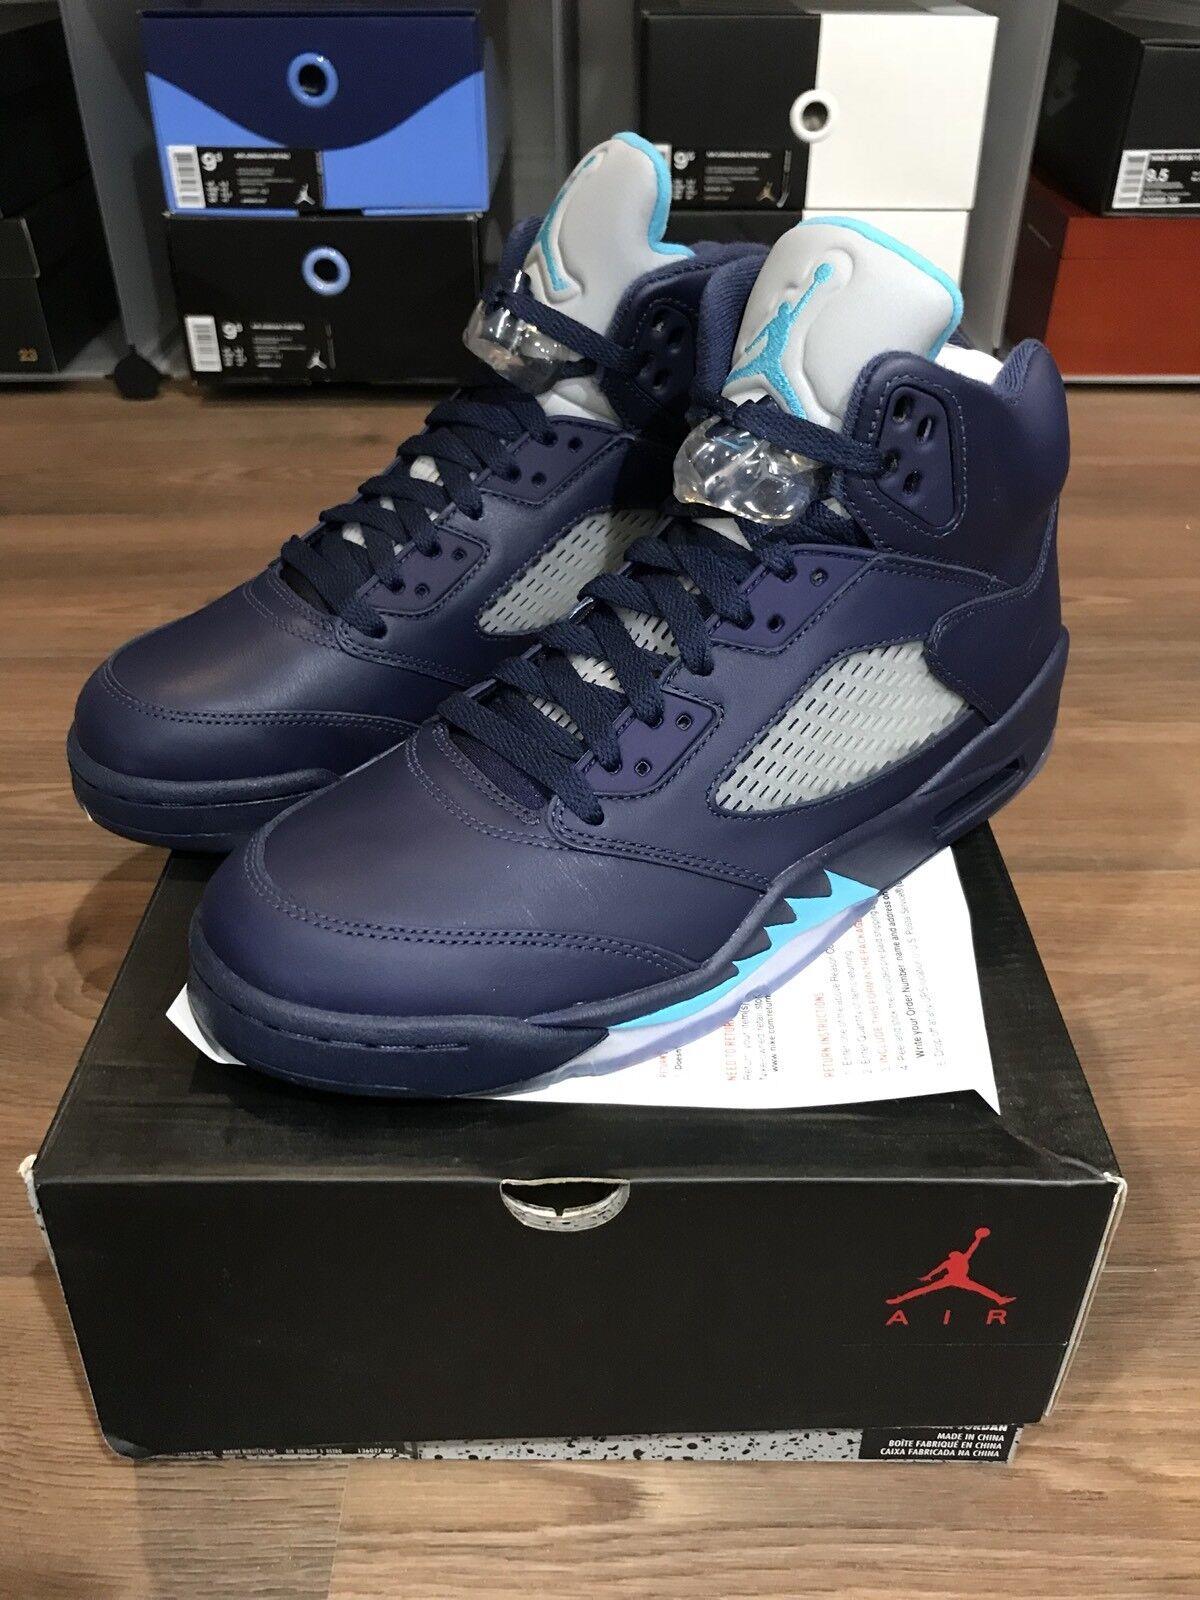 Nike tamaño Air Jordan 5 retro V pre UVA tamaño Nike 9,5 136027-405 marina nueva de24f5